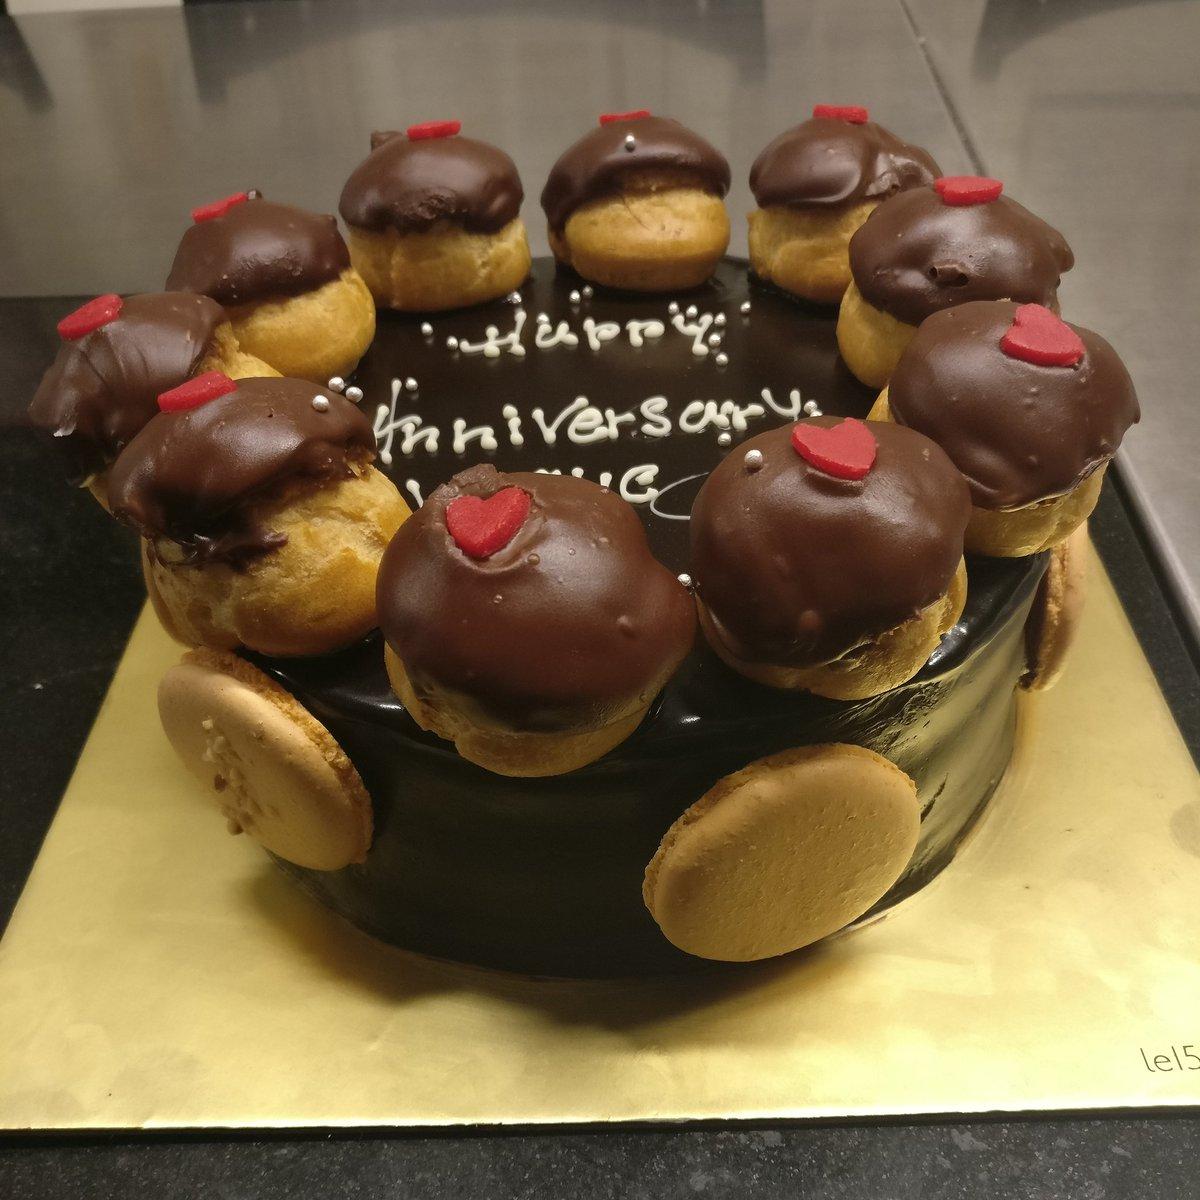 Cake Images Himanshu : Himanshu_jadav9008 (@himanshu9008) Twitter